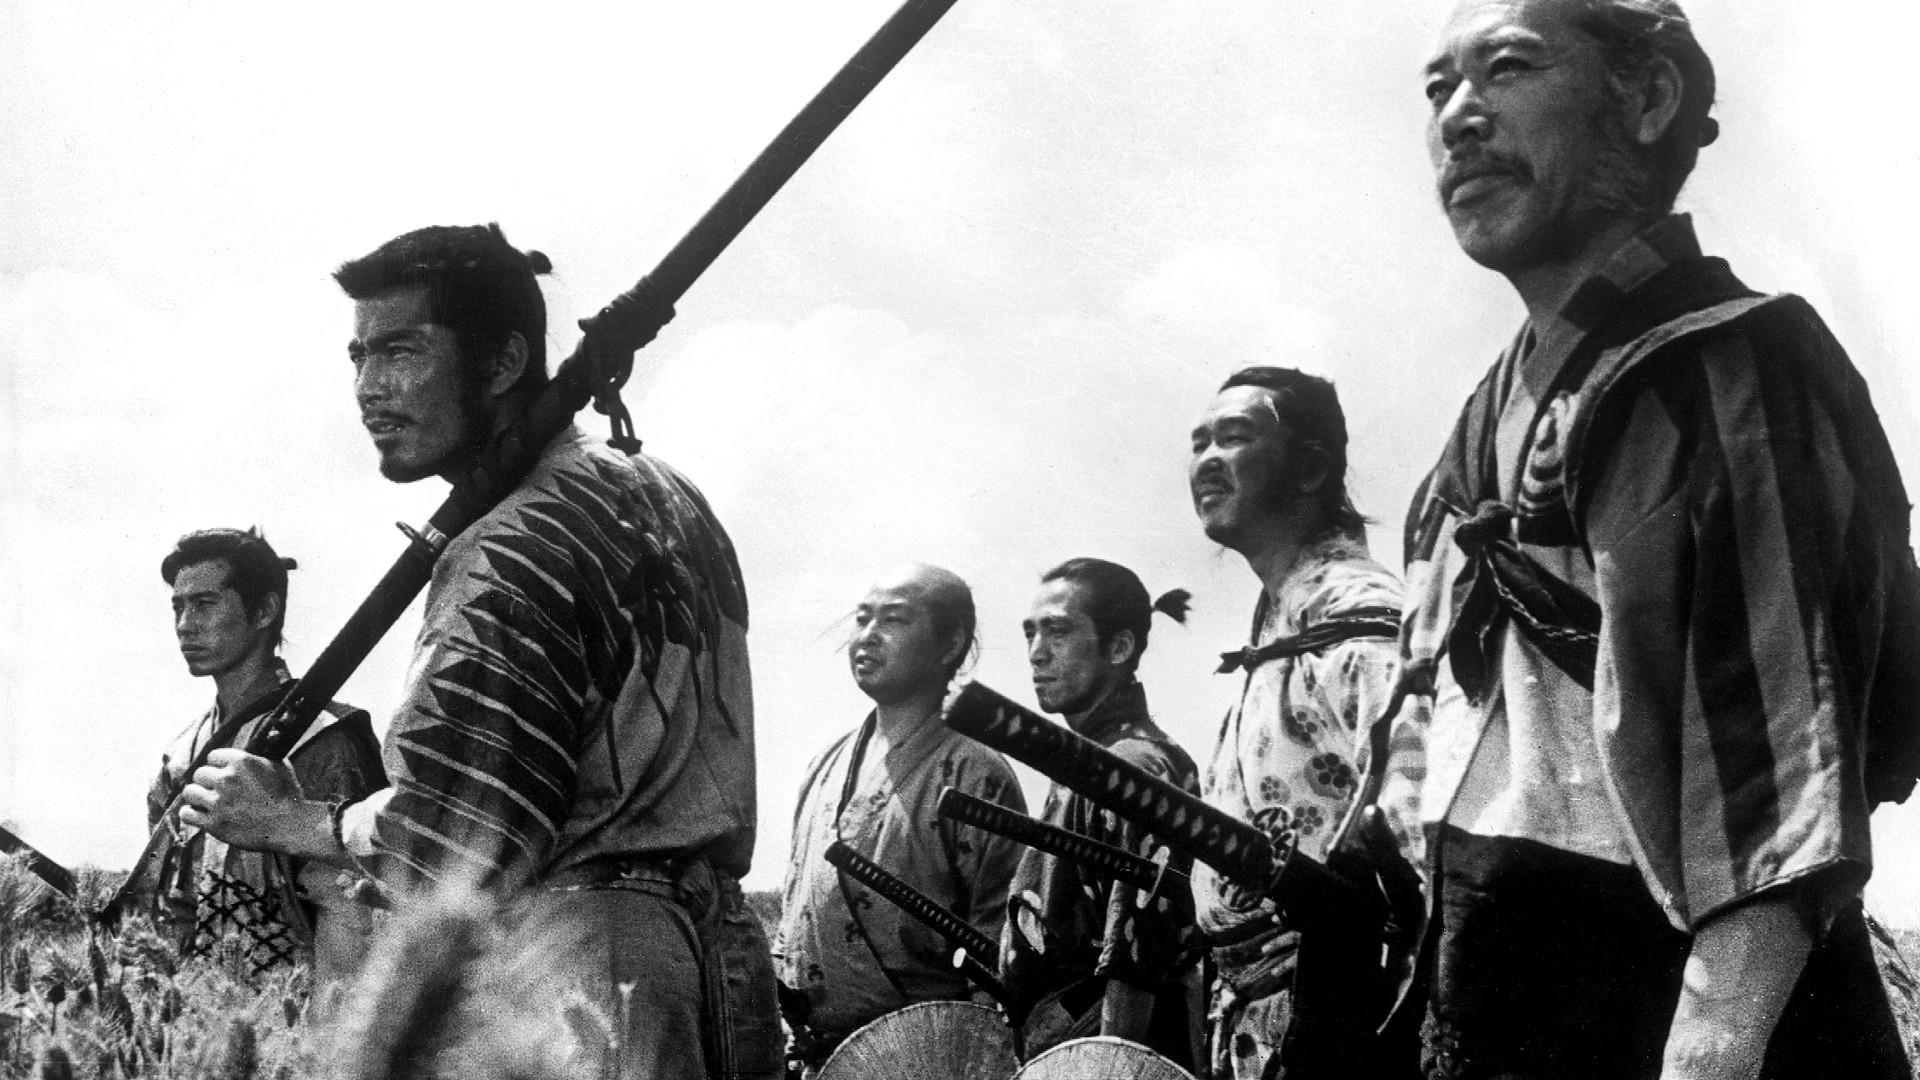 =19. Seven Samurai